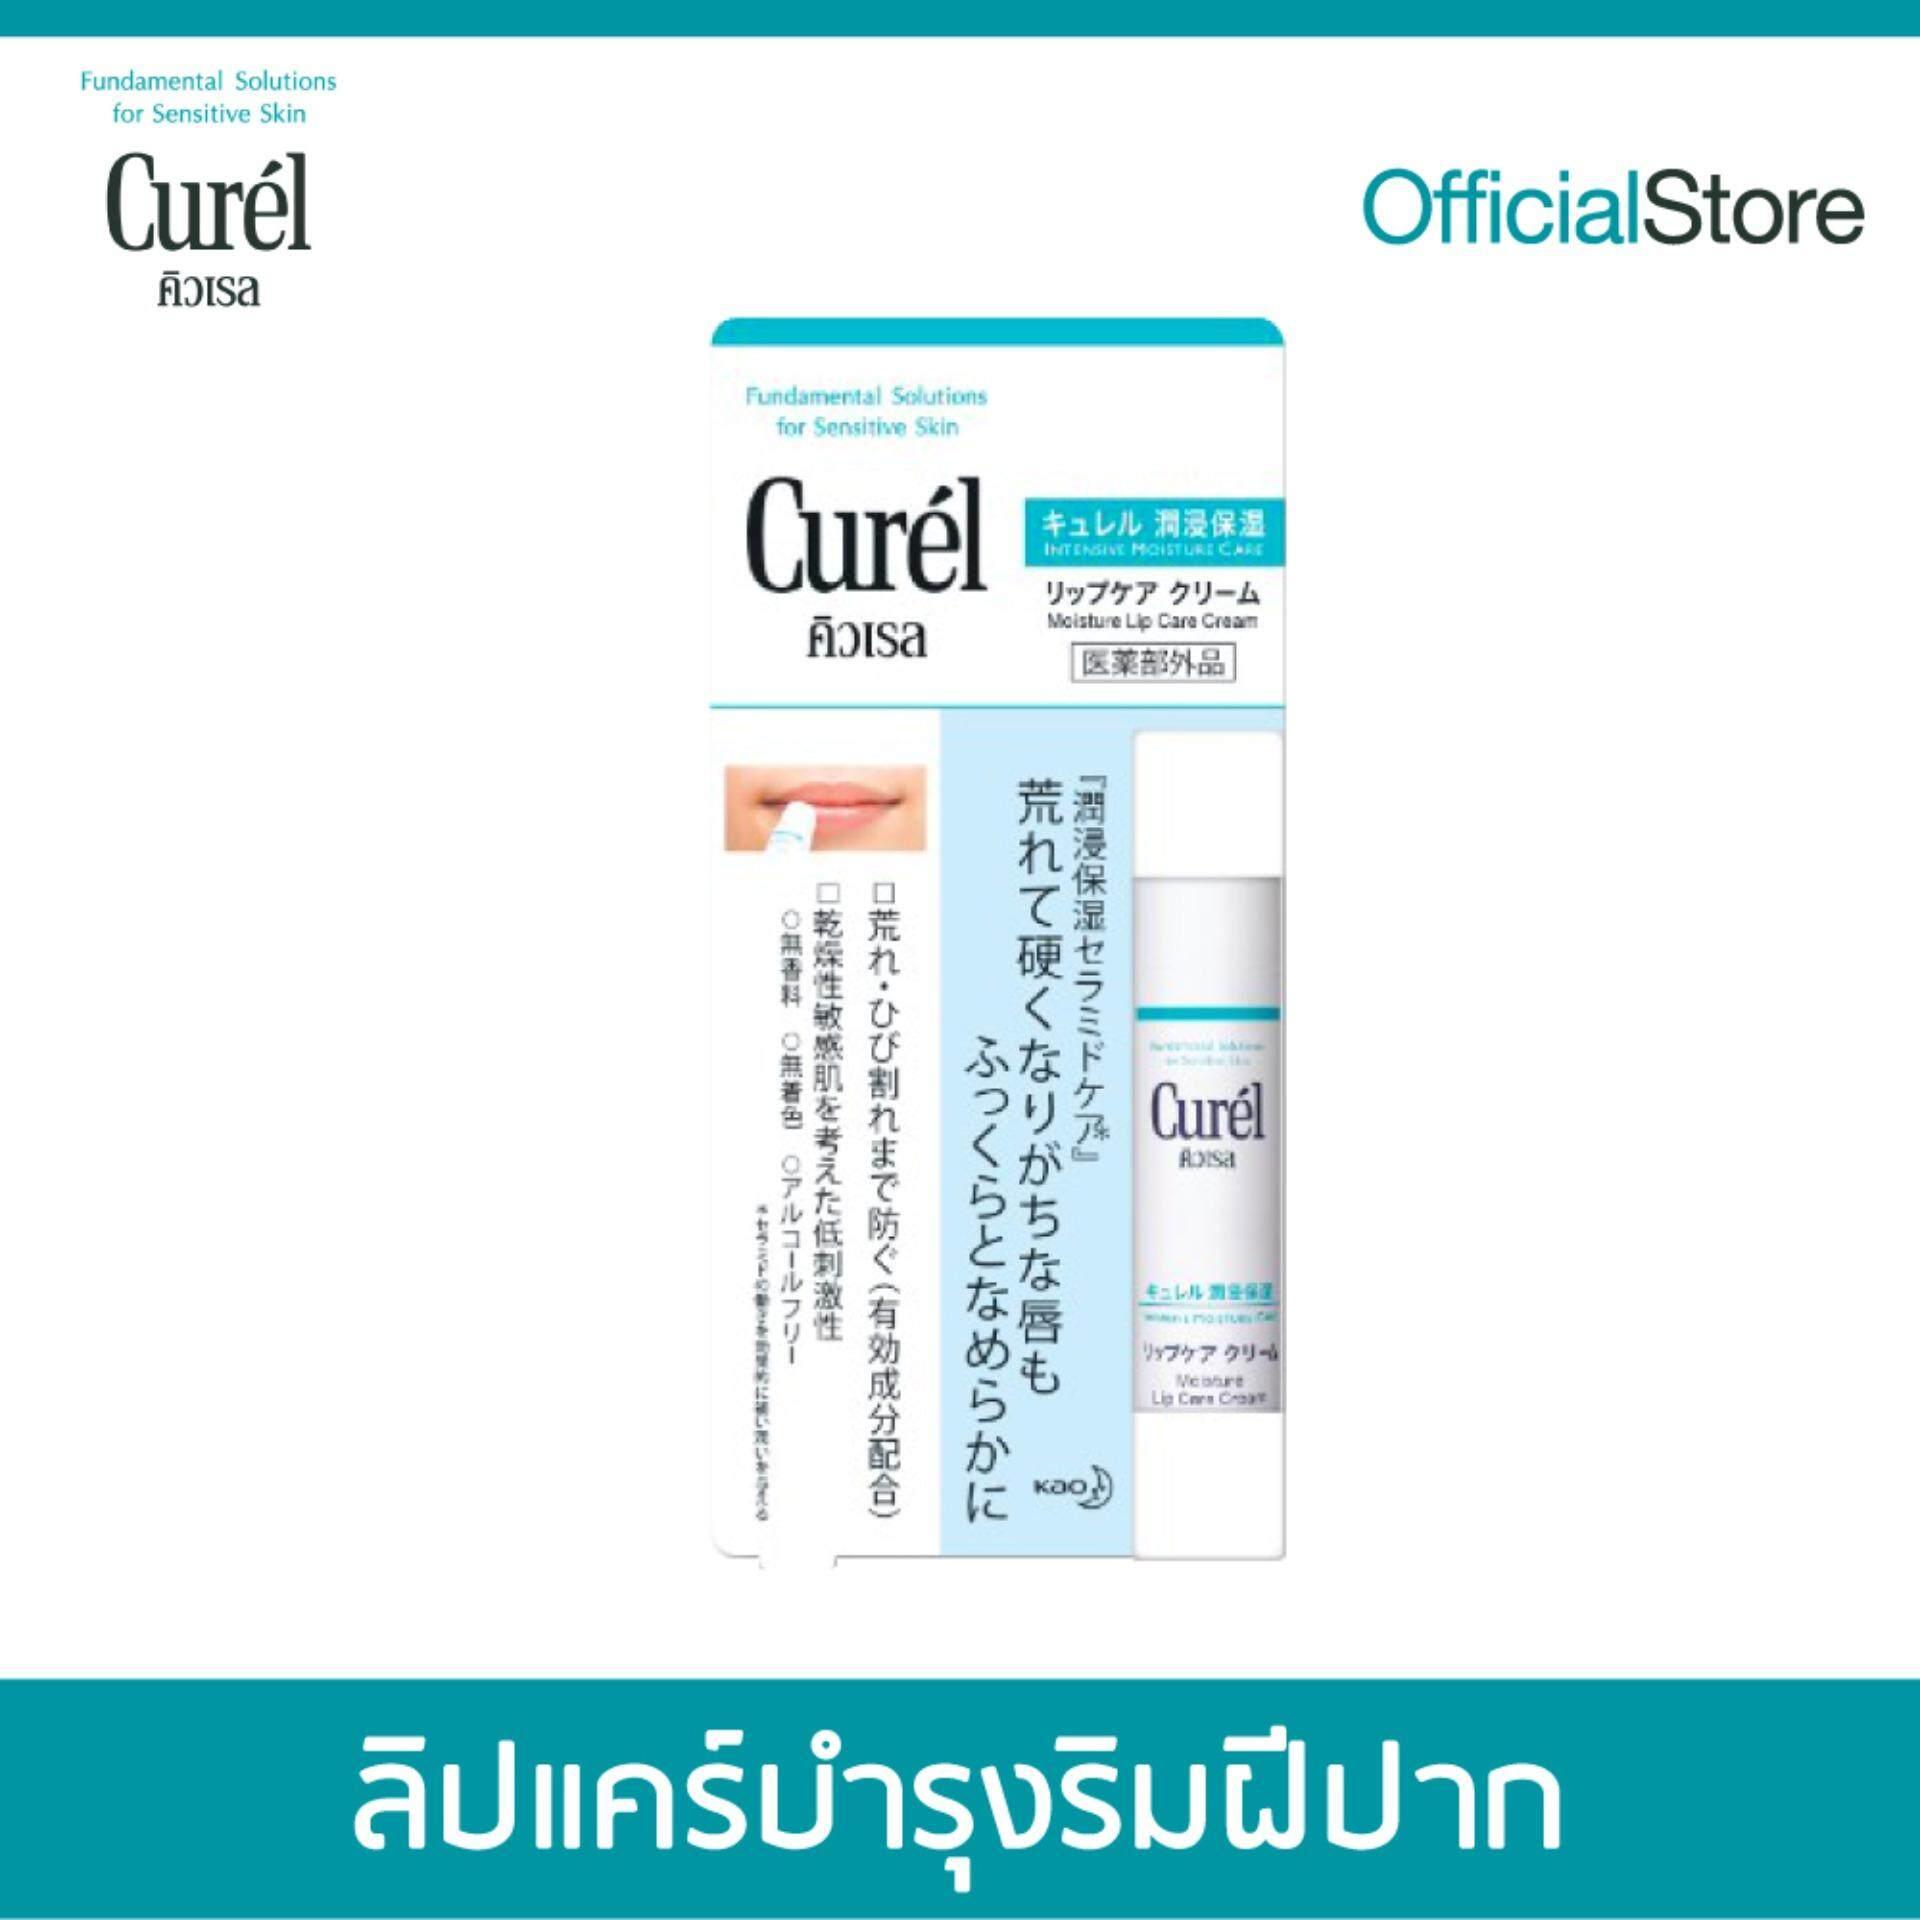 Curel Intensive Moisture คิวเรล อินเทนซีฟ มอยส์เจอร์ แคร์ มอยส์เจอร์ ลิป แคร์ ครีม 4.2 กรัม By Curel Thailand.